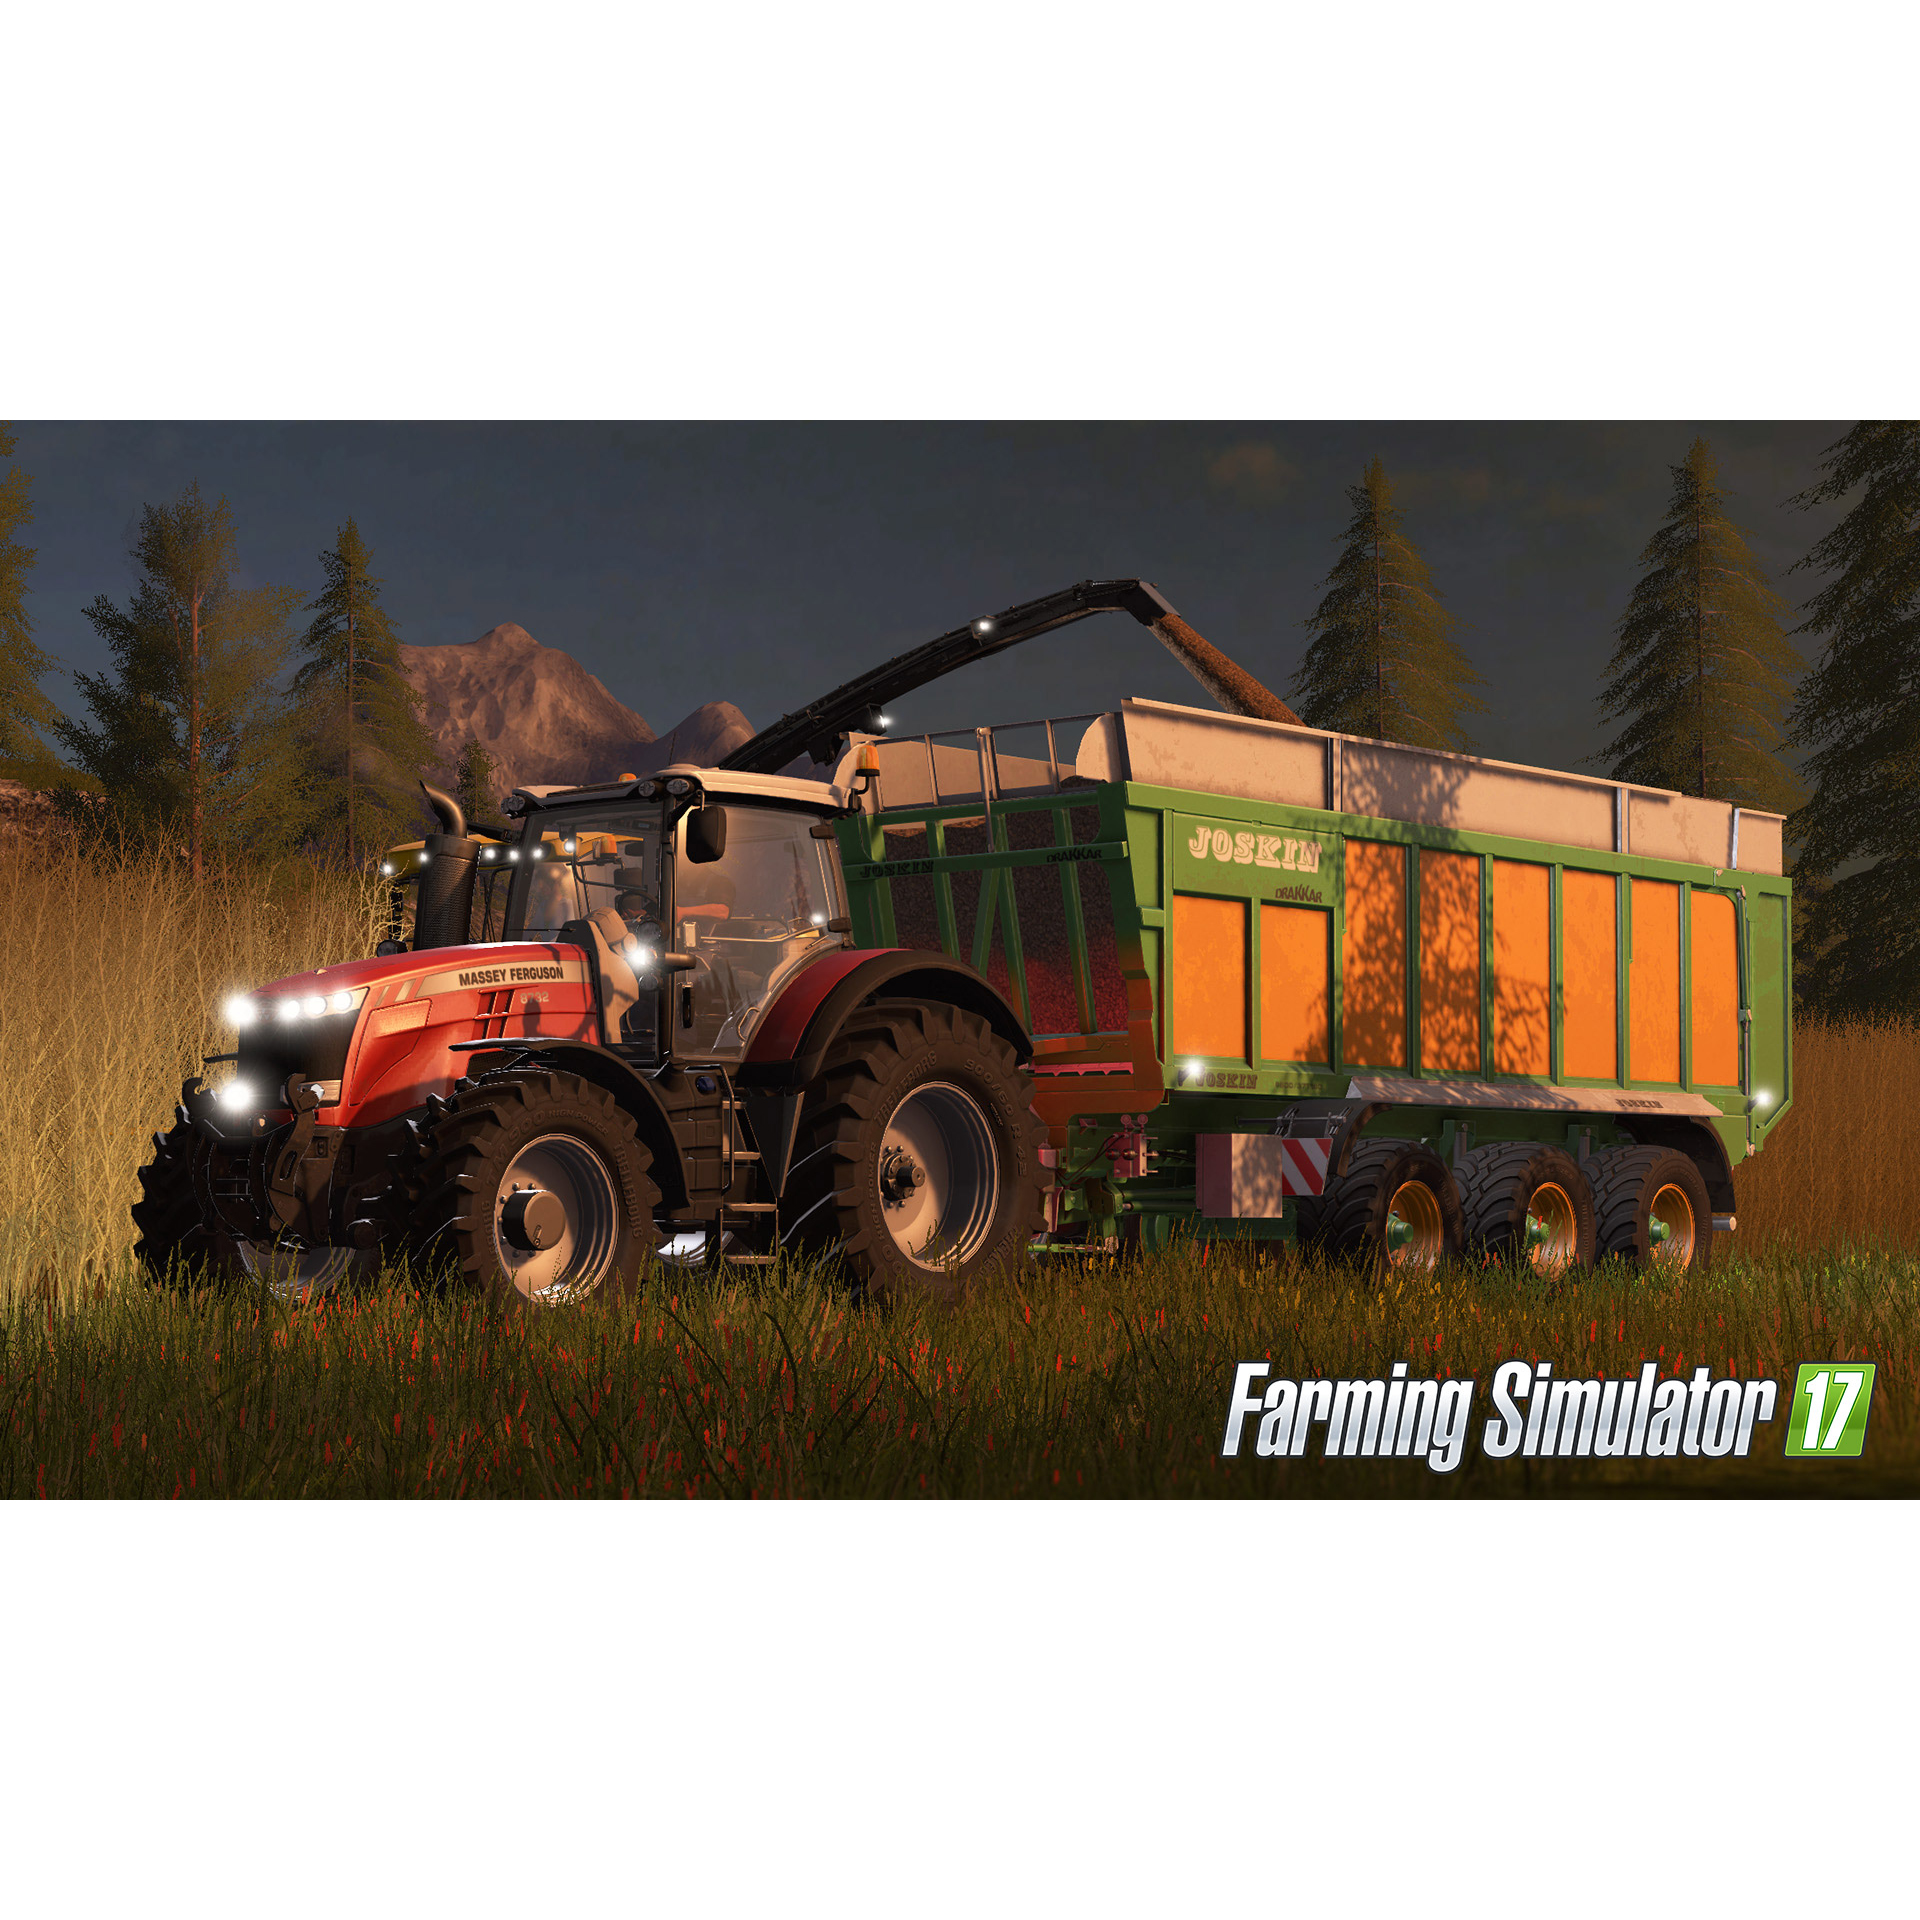 Farming simulator 17 Platinum edition, Xbox One 5